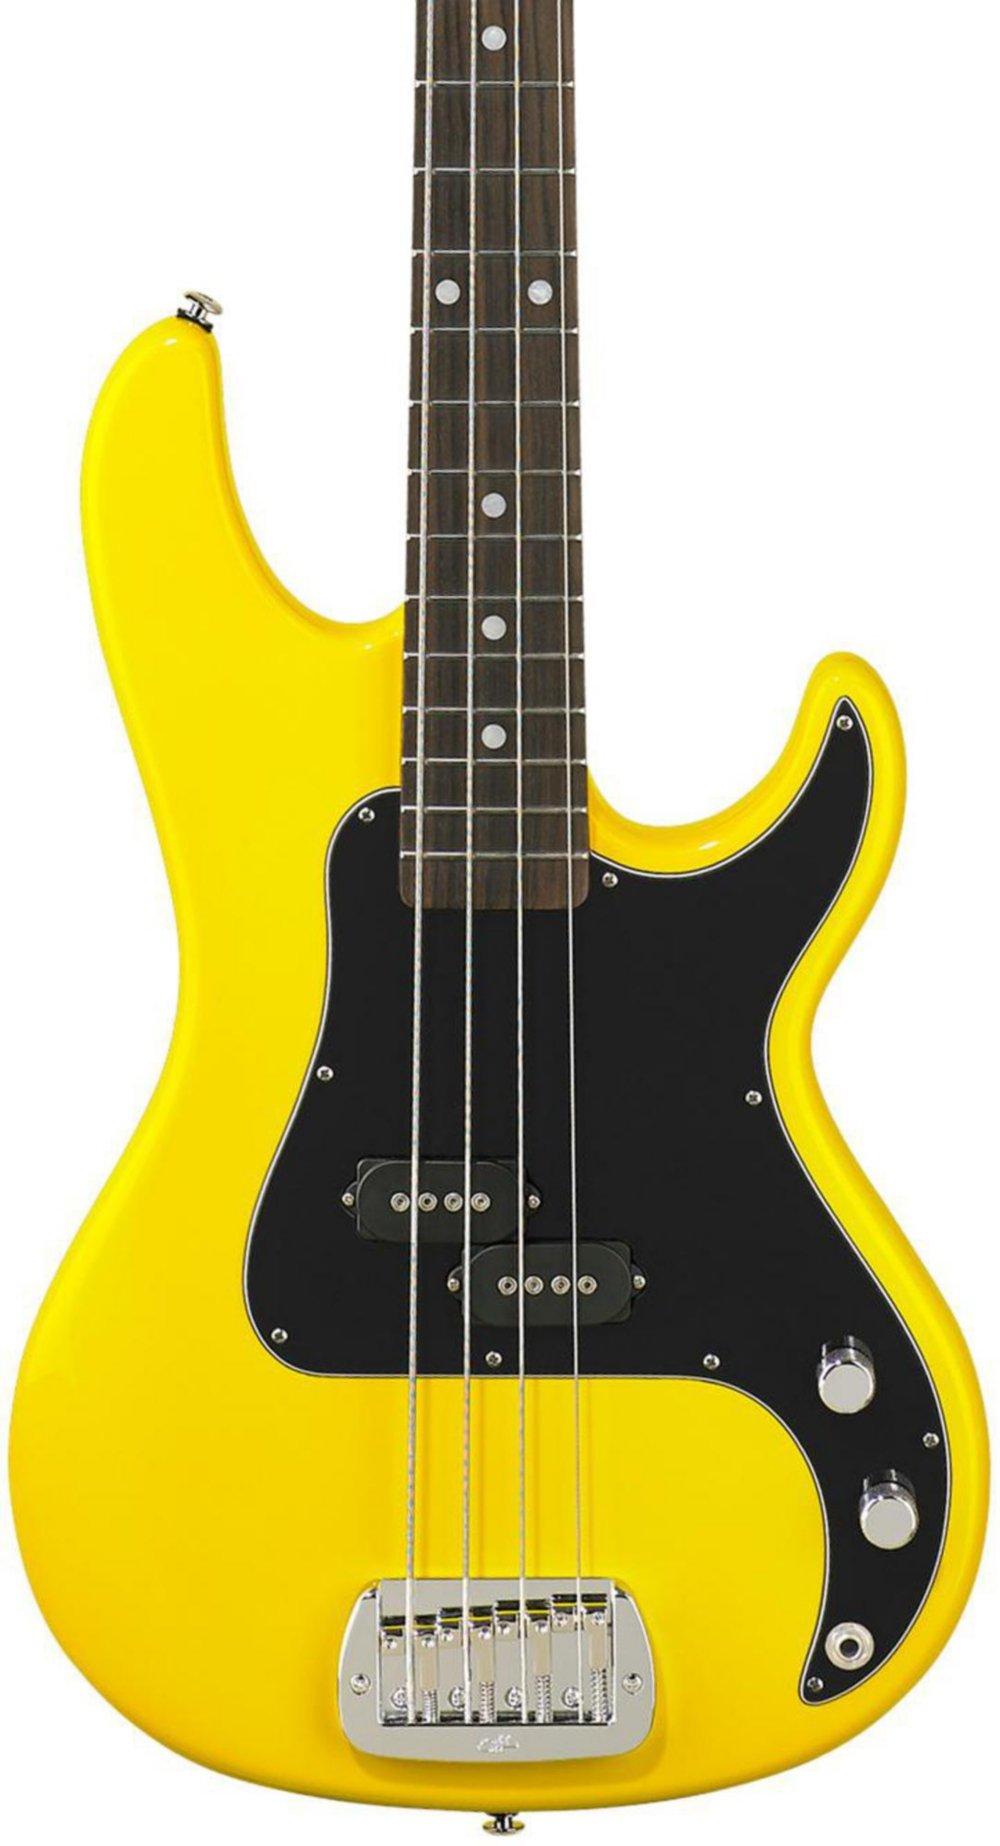 Cheap G&L SB-1 Electric Bass Guitar Yellow Fever Black Friday & Cyber Monday 2019